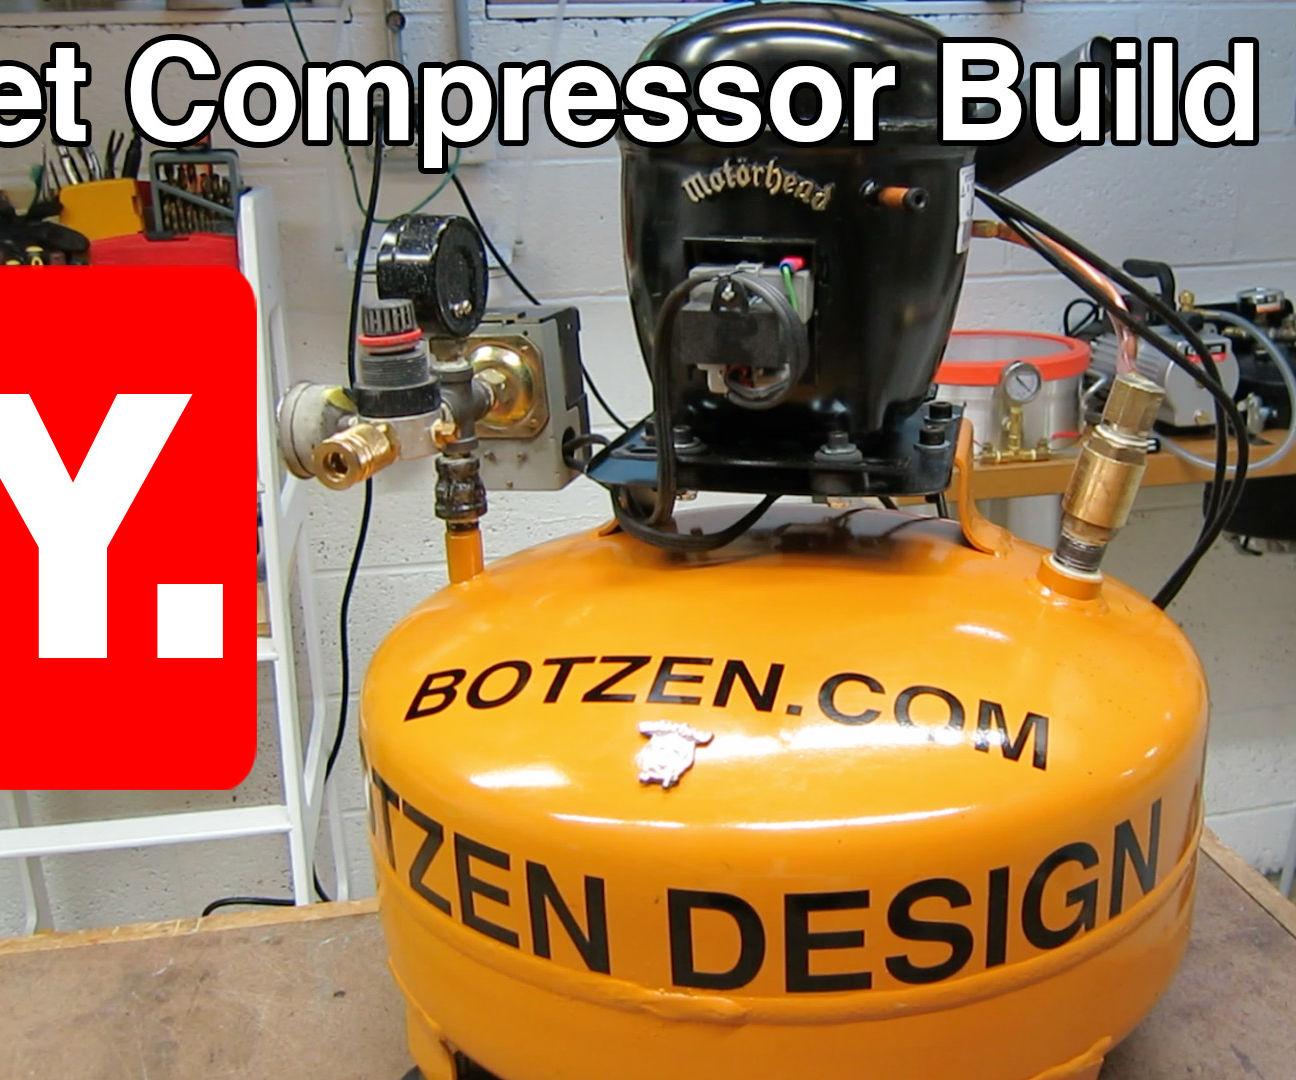 hight resolution of d i y ultra quiet shop compressor from a refrigerator motor compressor